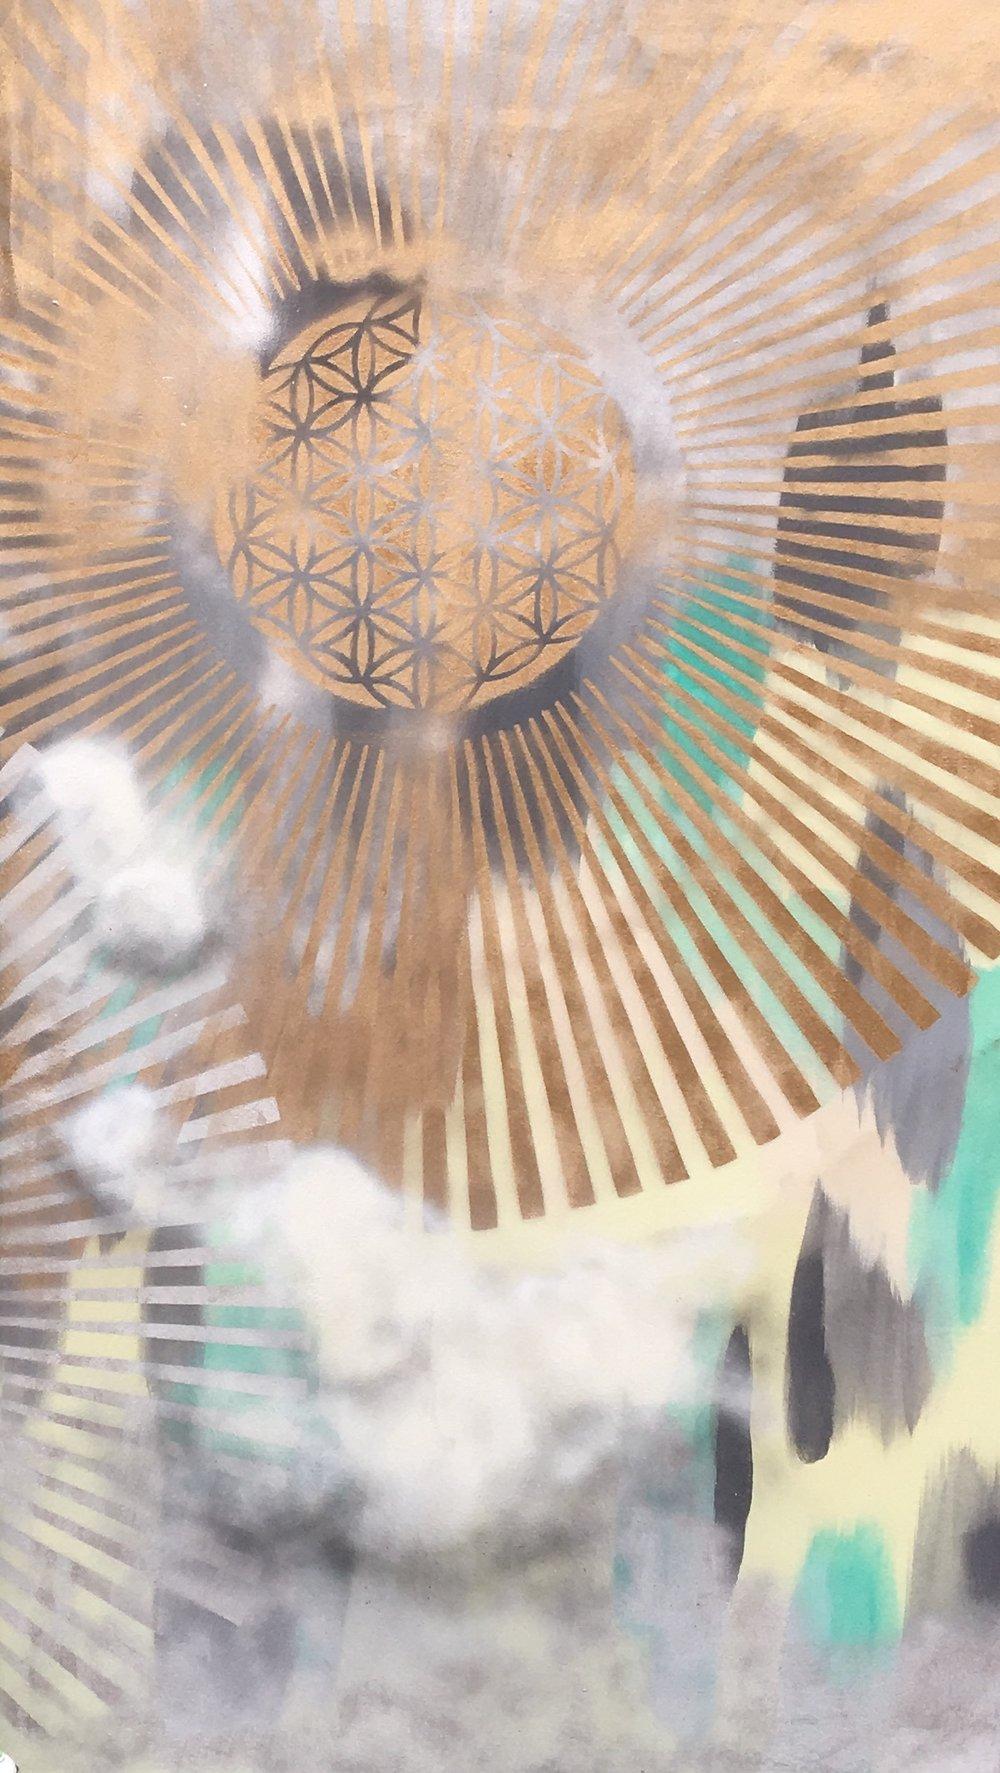 LeahGuzman-Energetic Connections II-3_6_x6_-acrylic,spray,canvas-2018-6,000.00.jpg